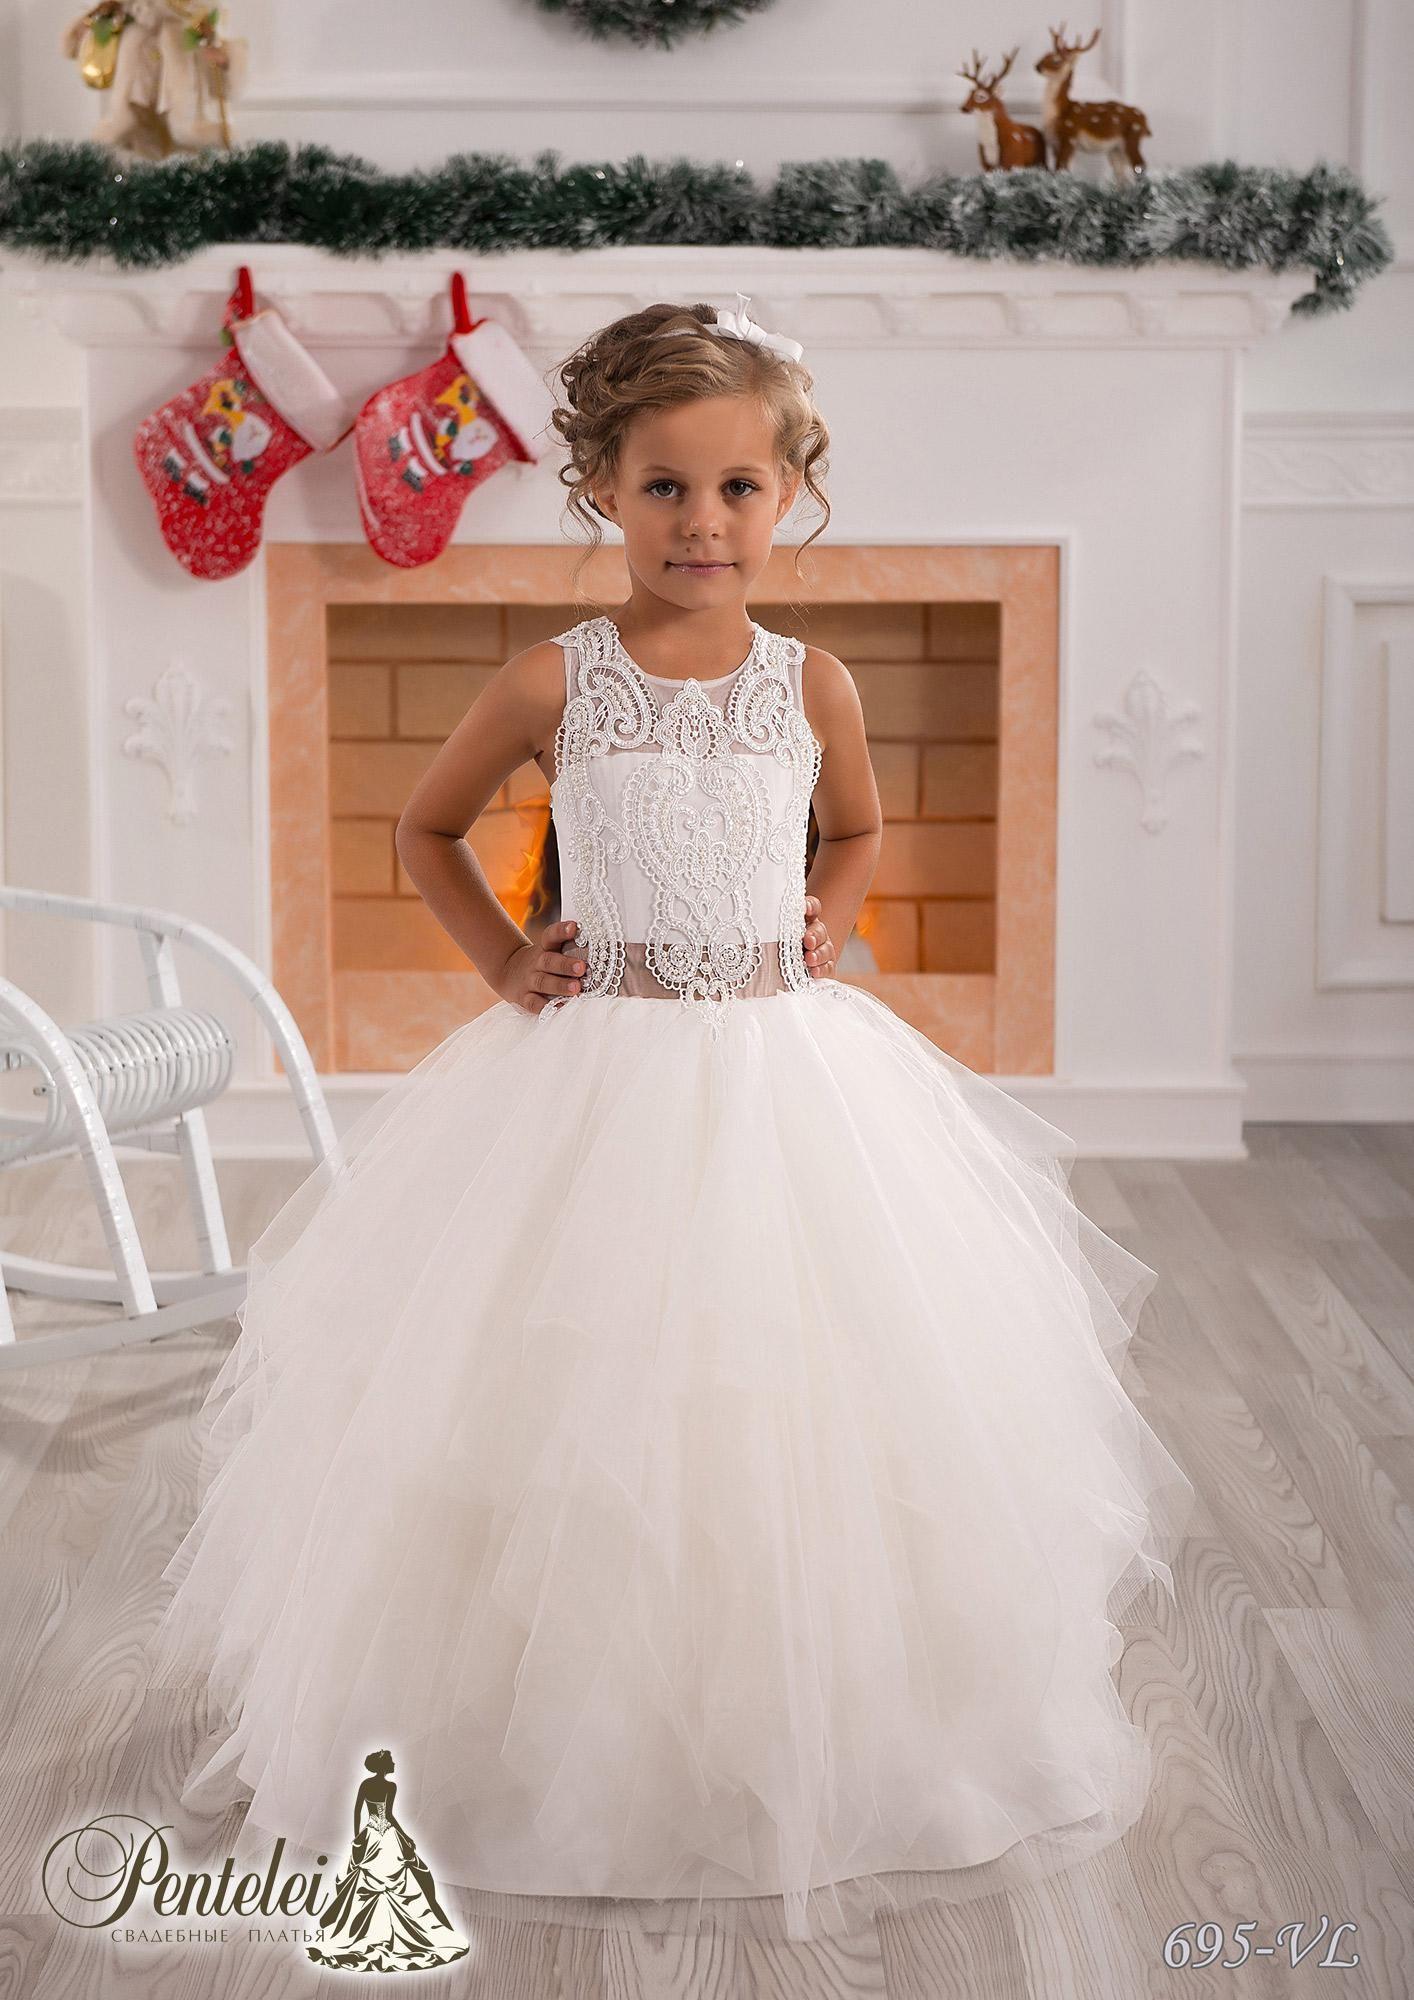 2017 Boho Simple Cute Jewel Applique Sash Net Baby Girl Birthday